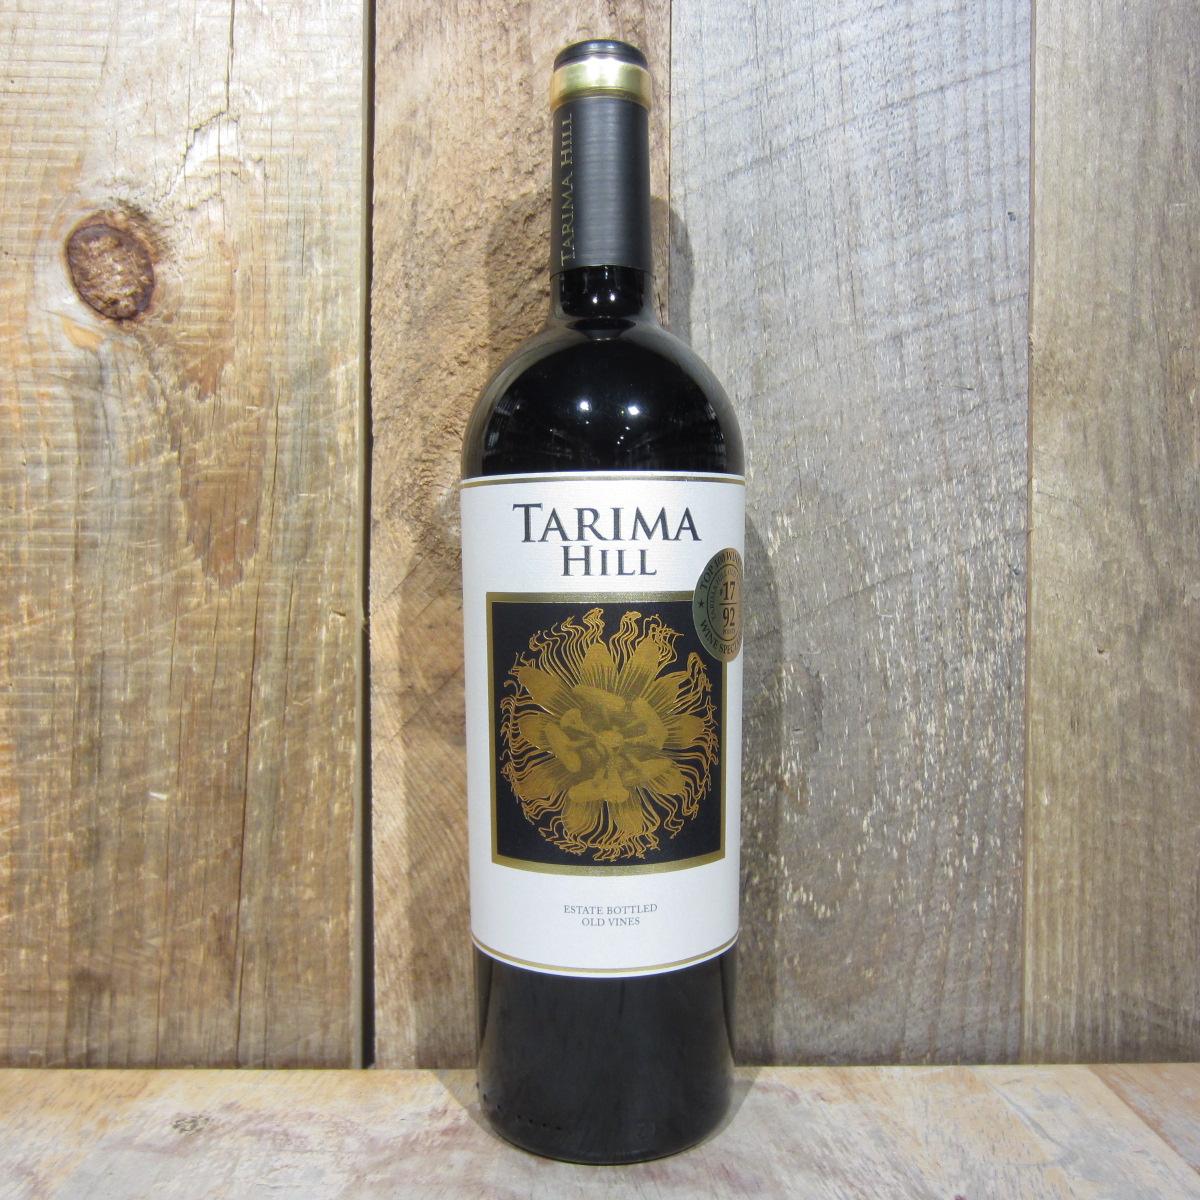 Tarima Hill Old Vines Monastrell 2017 750ml